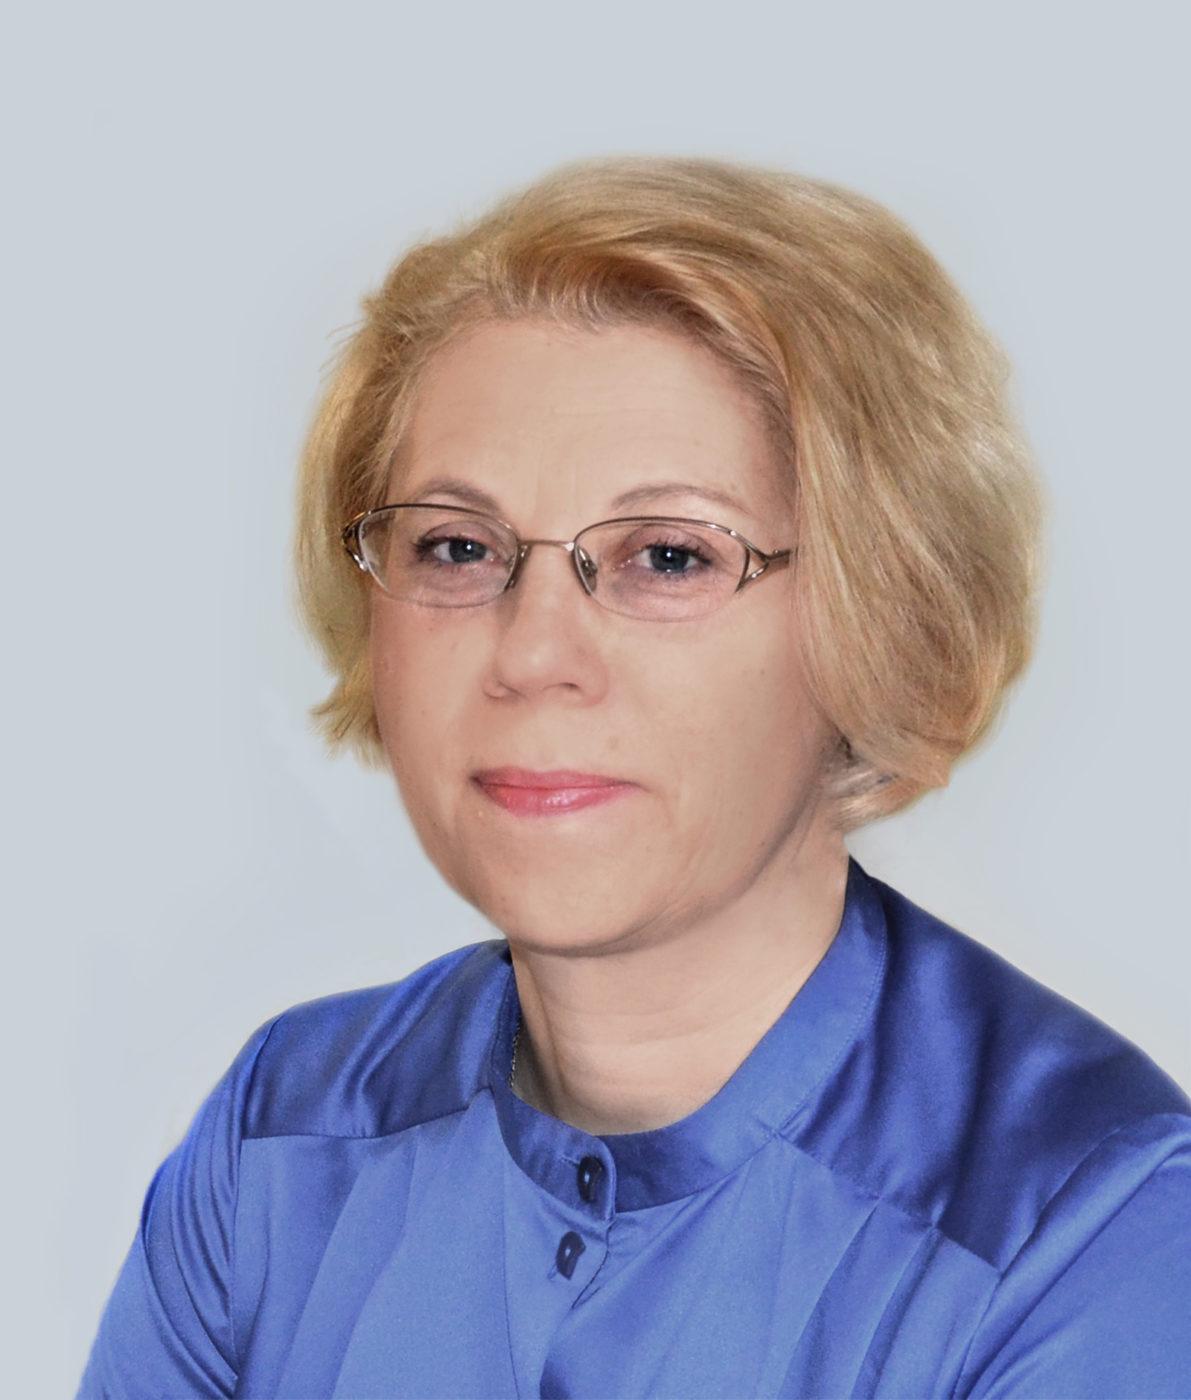 IRINA SIVKOVA